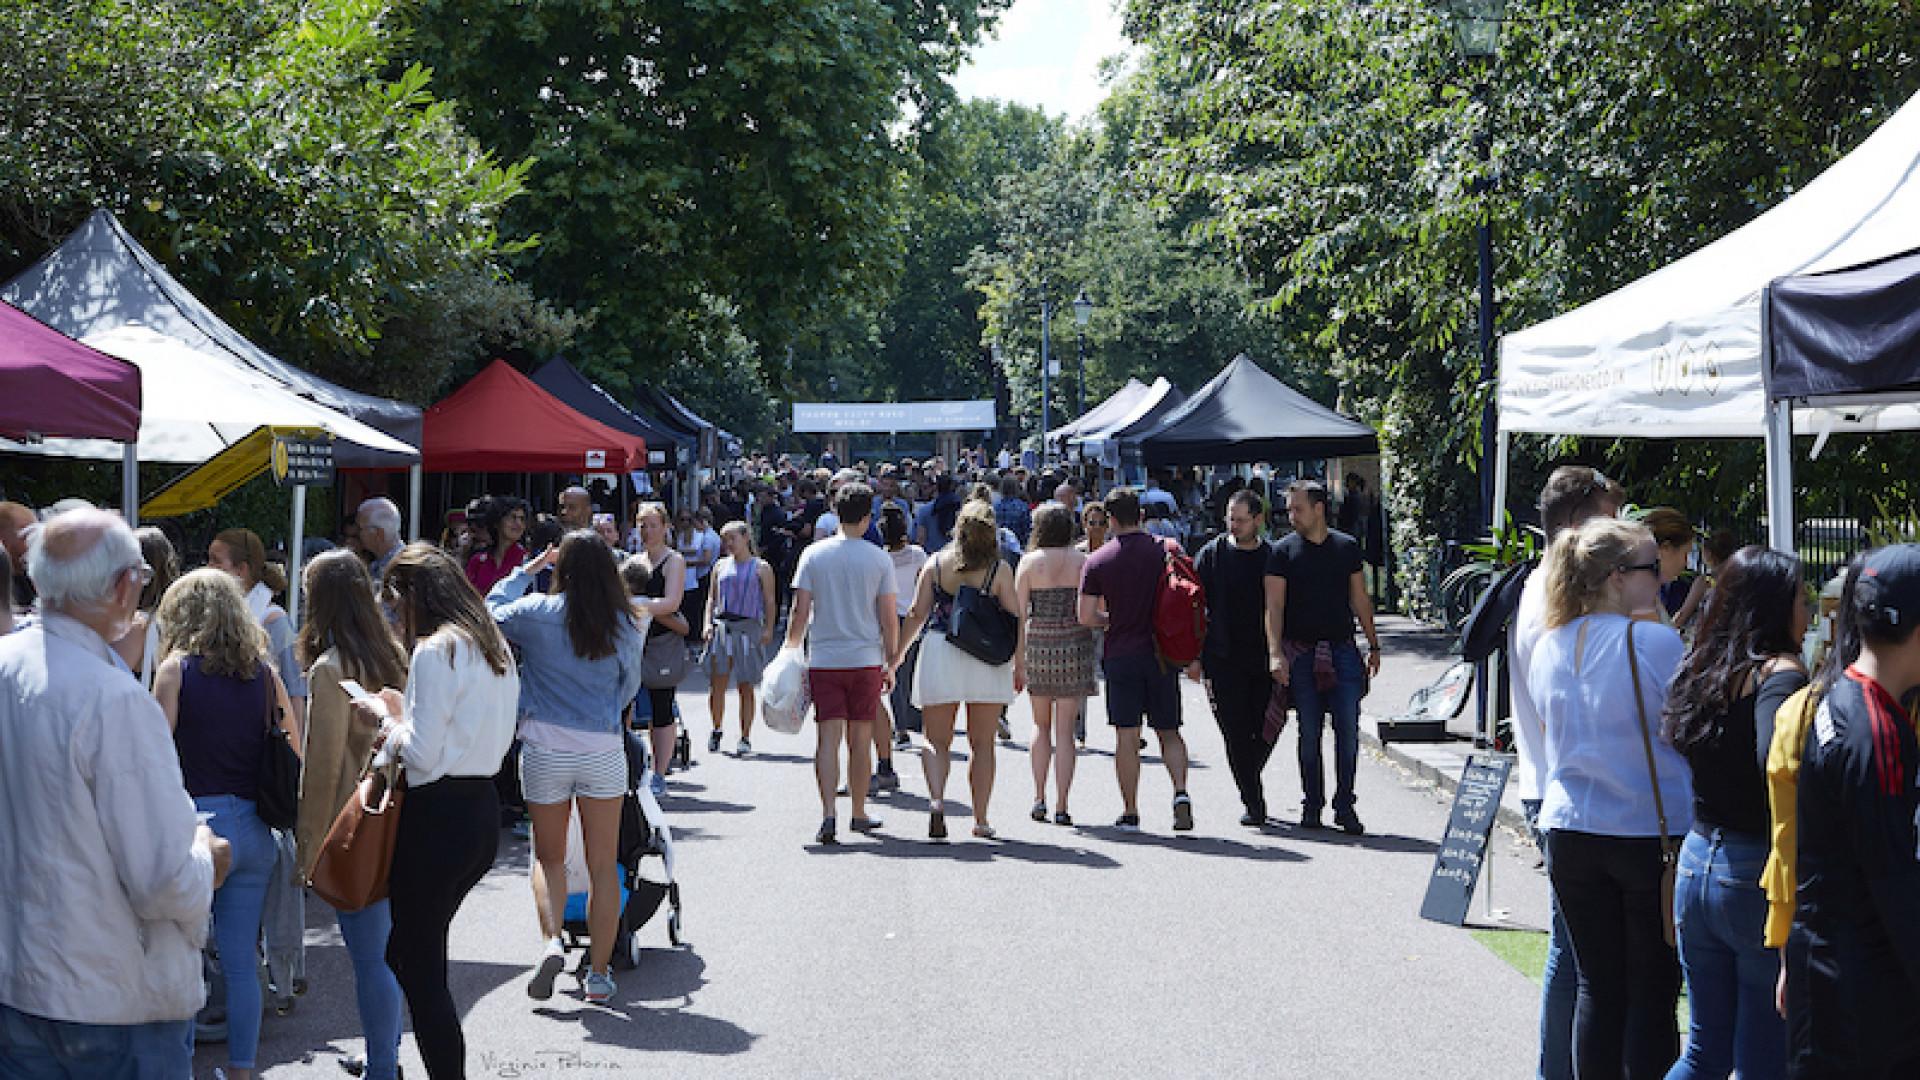 Victoria Park Market